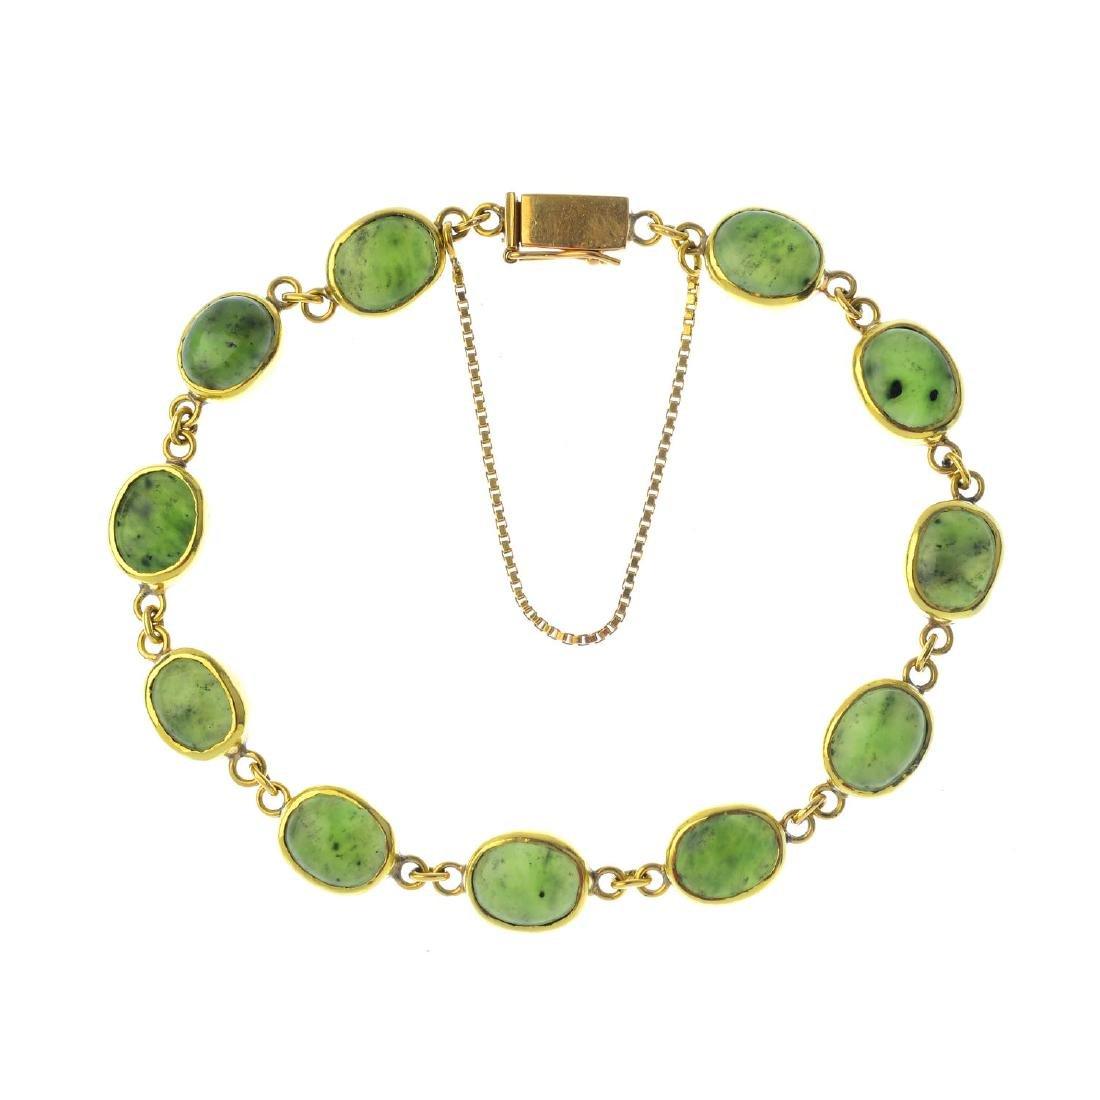 A jade bracelet. Designed as a series of oval nephrite